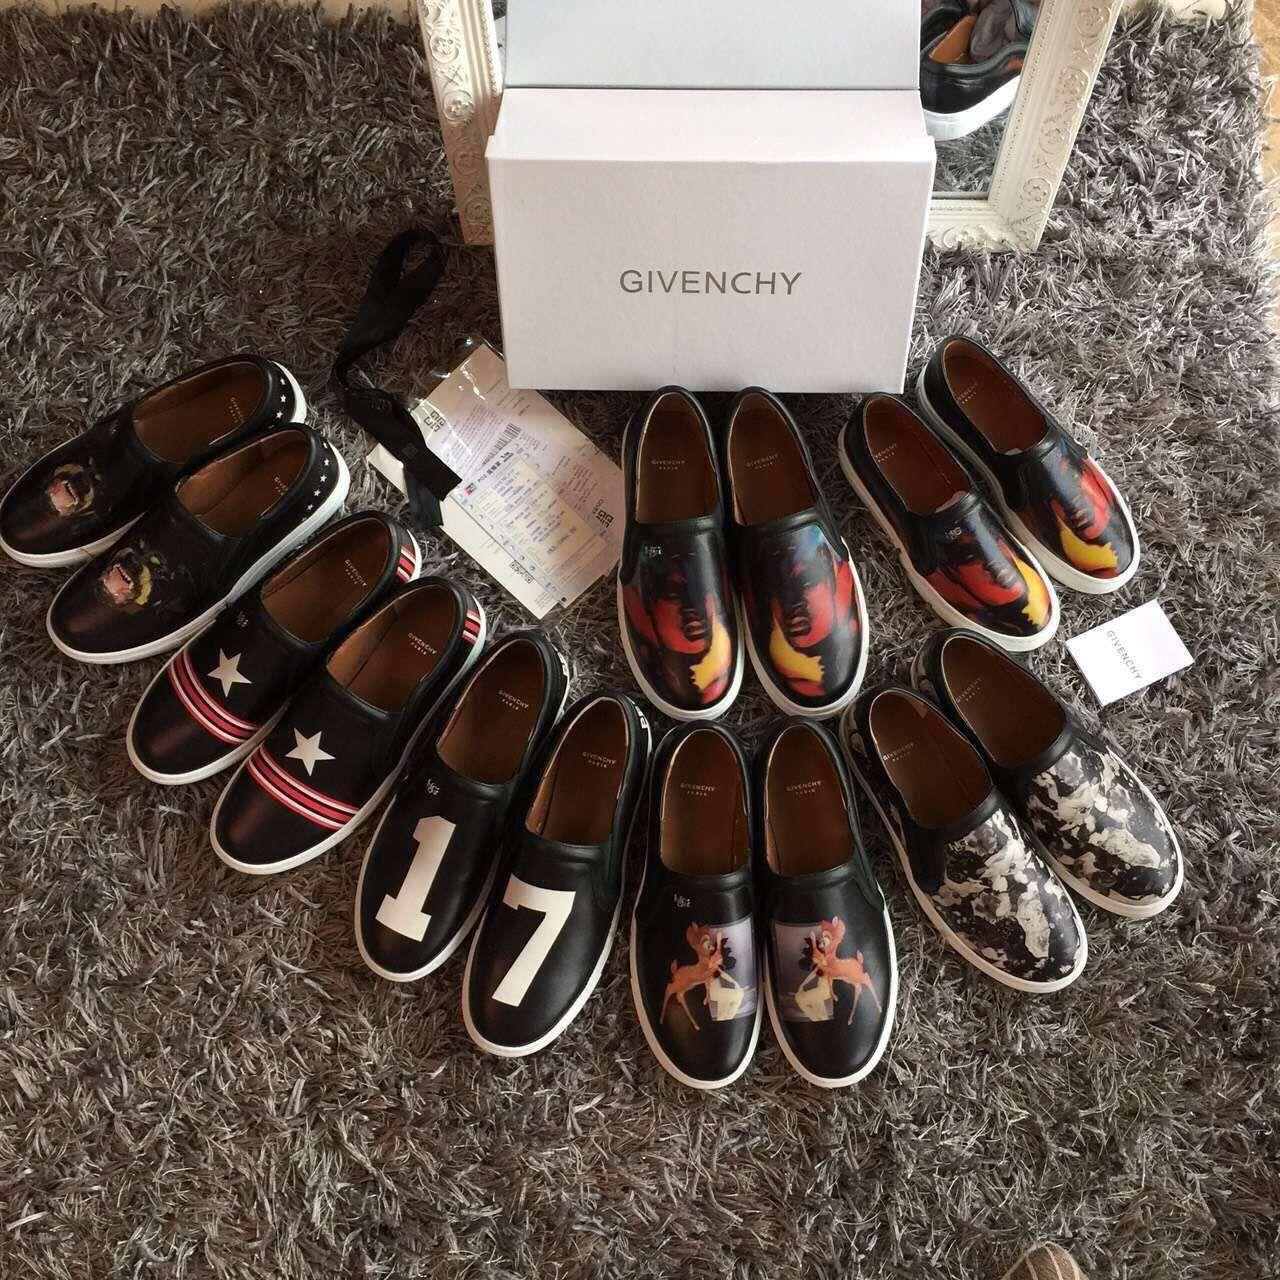 Givenchy kids shoe | Kids shoes, Shoes